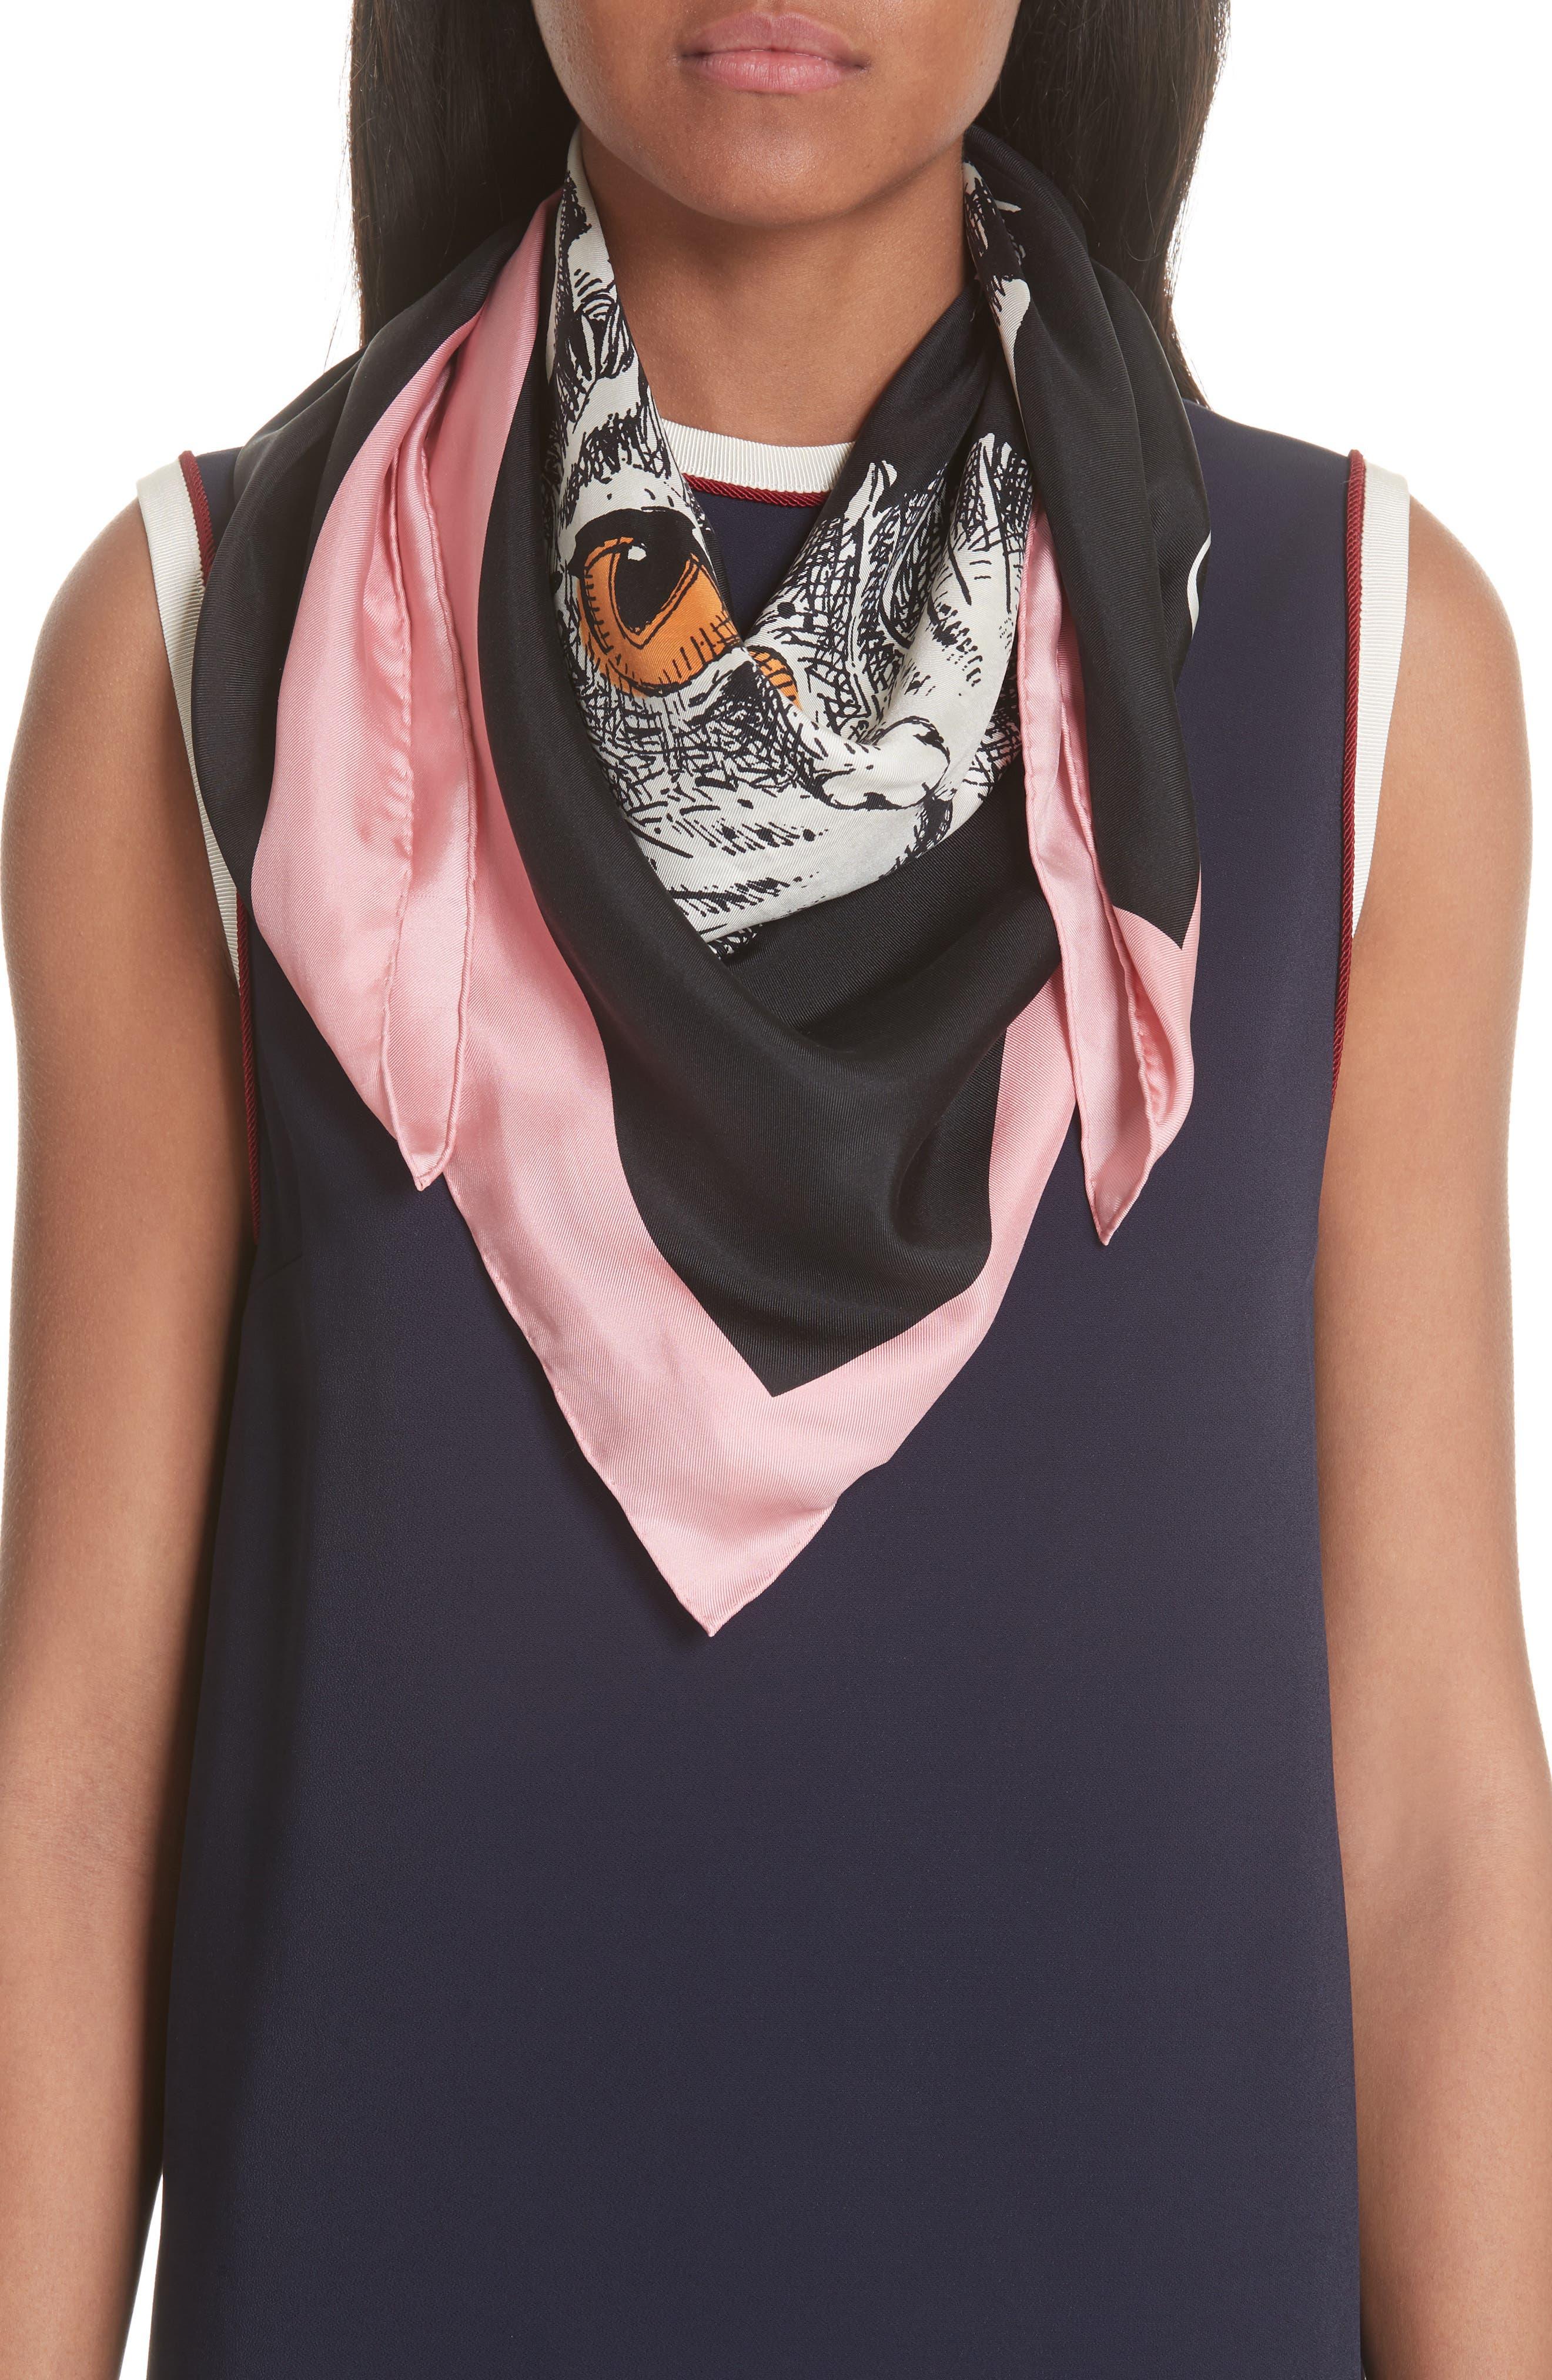 Foulard Forcats Mystic Cat Square Silk Scarf,                             Alternate thumbnail 2, color,                             Black/ Pink